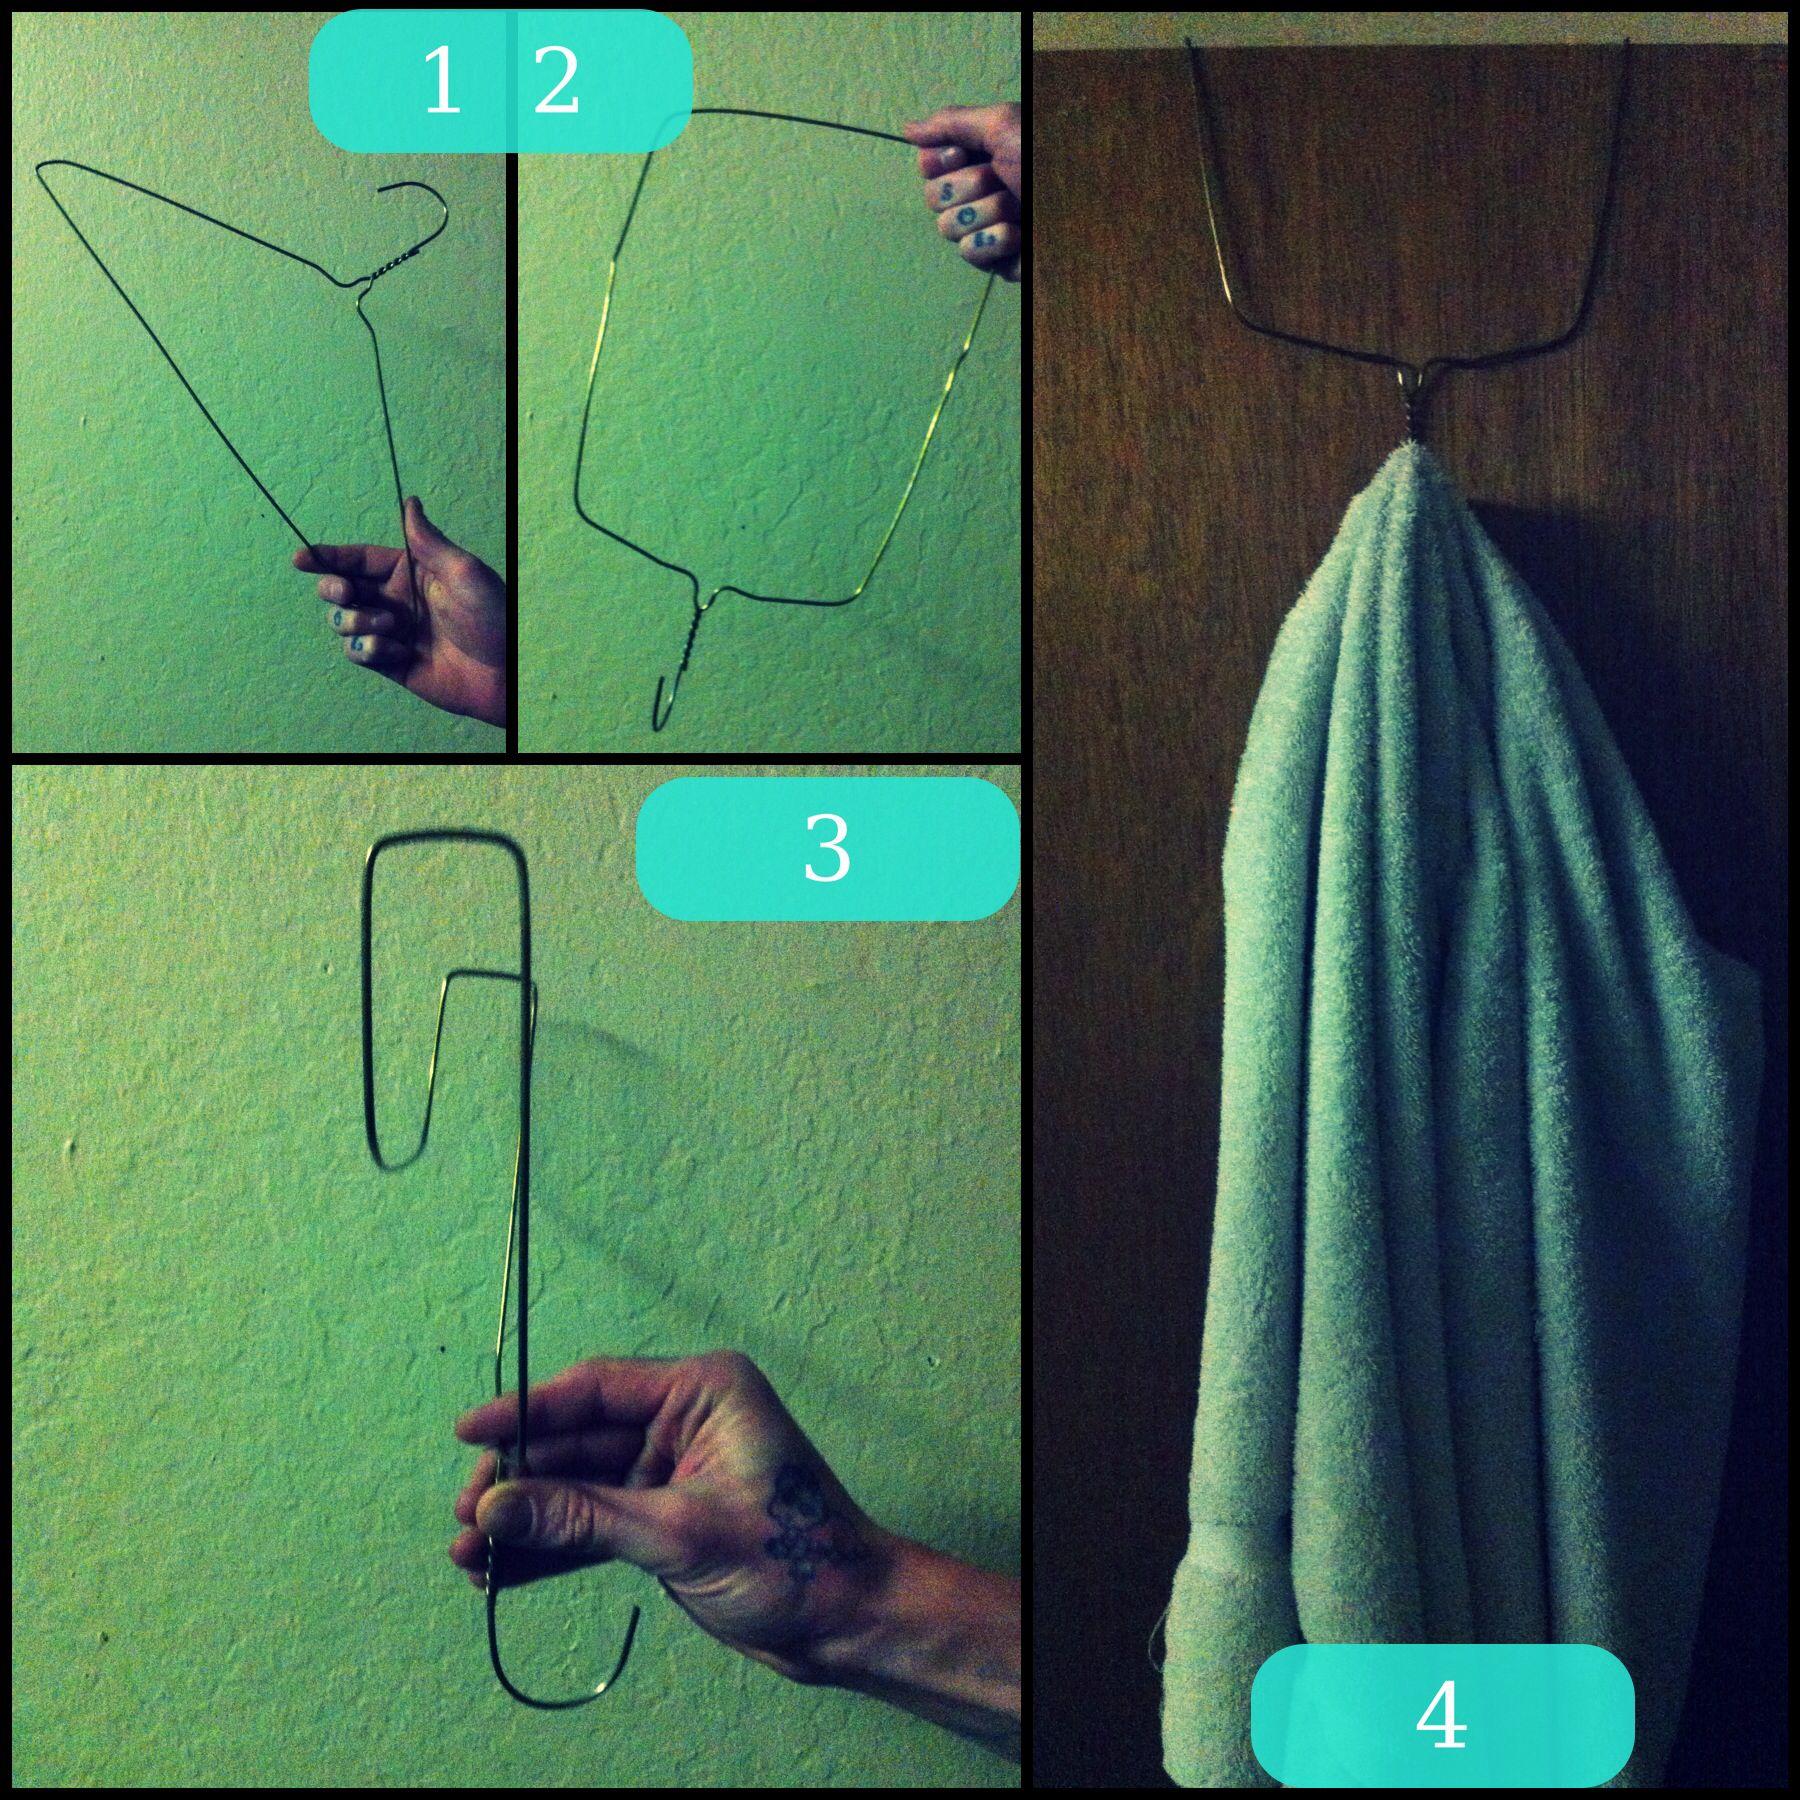 Pin By Kelsey Adams On Diy Ideas Wire Hanger Crafts Diy Wreath Hanger Hanger Crafts